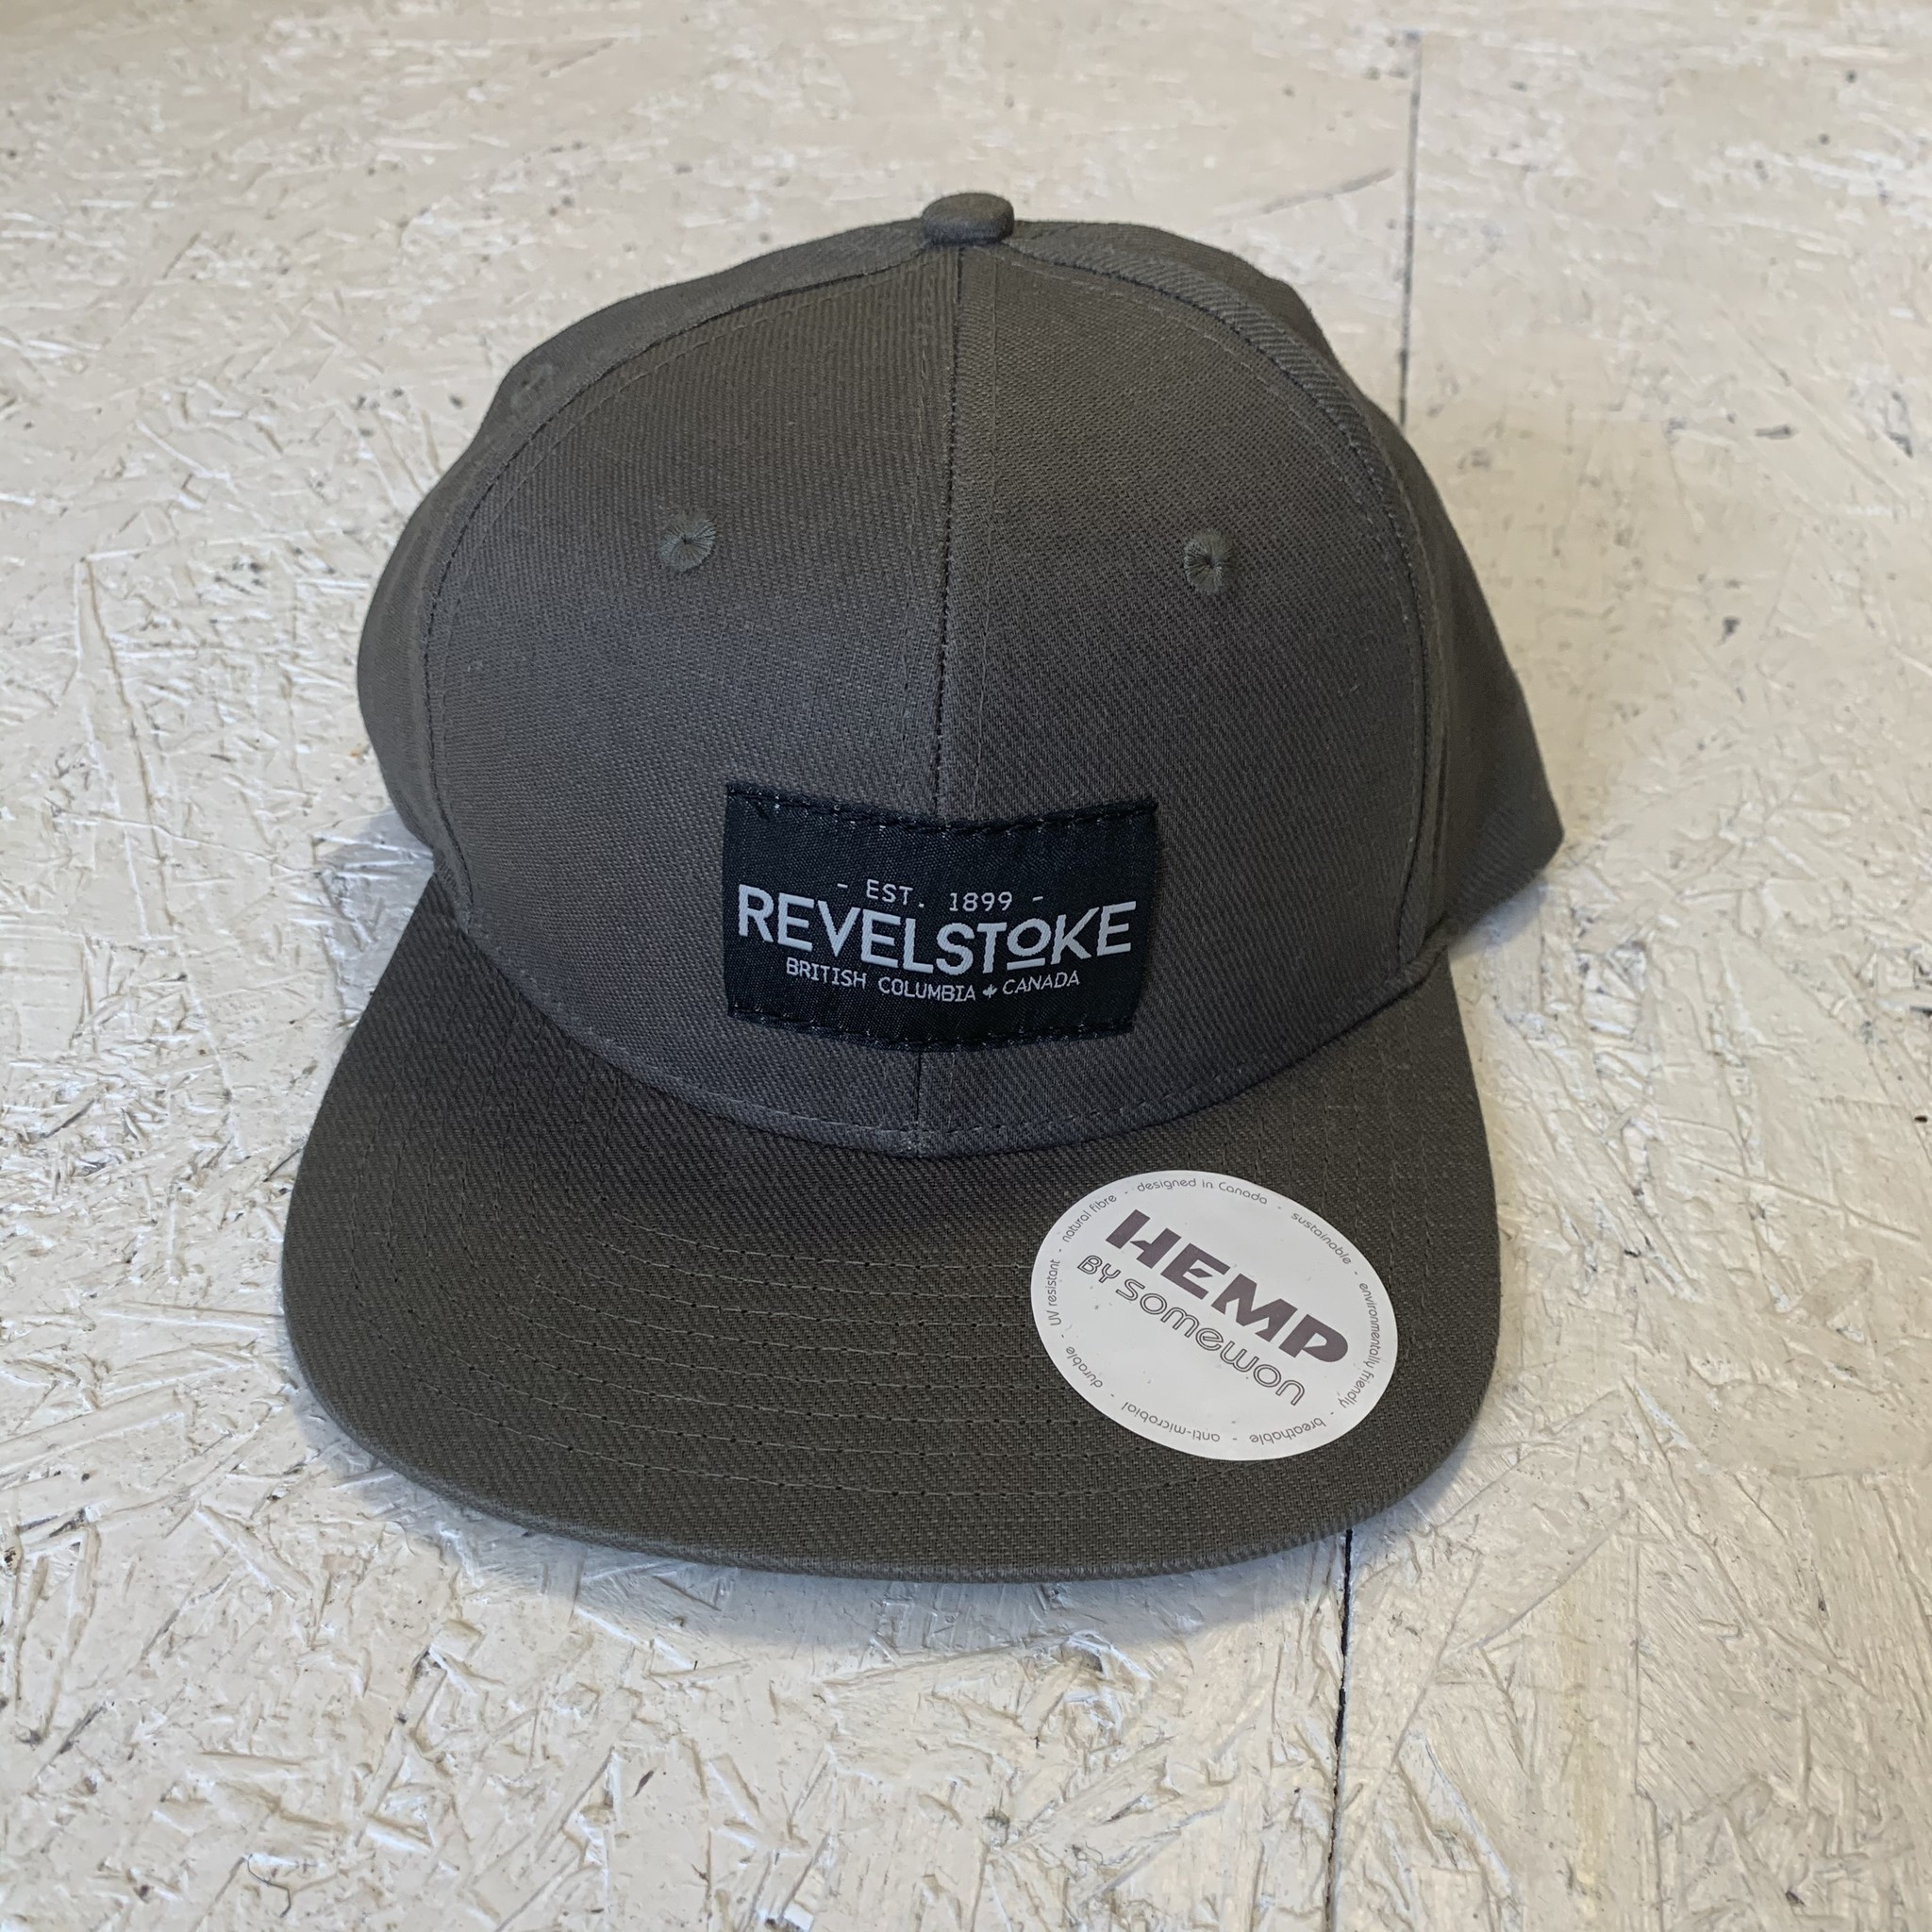 Revelstoke Trading Post Revelstoke - Trading Co Hemp Flat Brim Cap - Olive